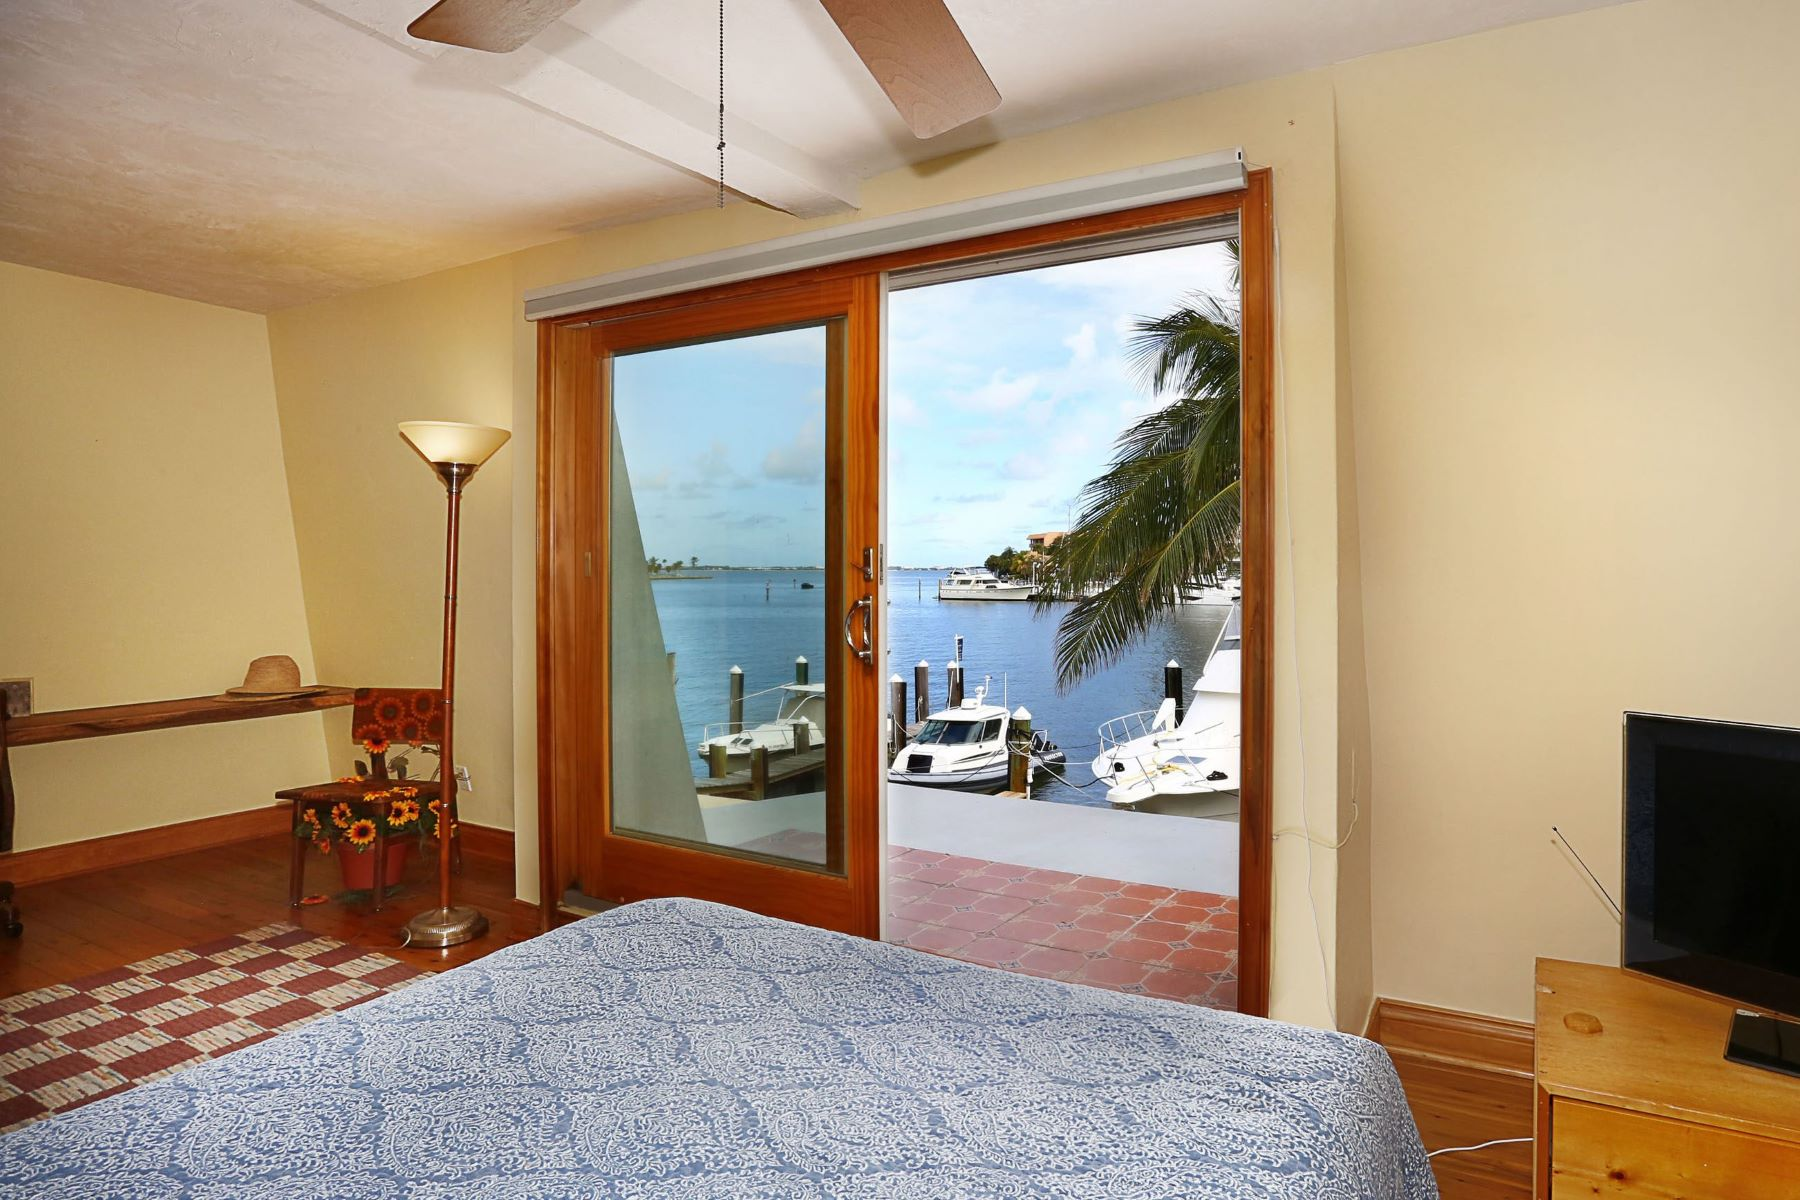 Single Family Home for Sale at 1788 S Bayshore Ln 1788 S Bayshore Ln Coconut Grove, Florida 33133 United States